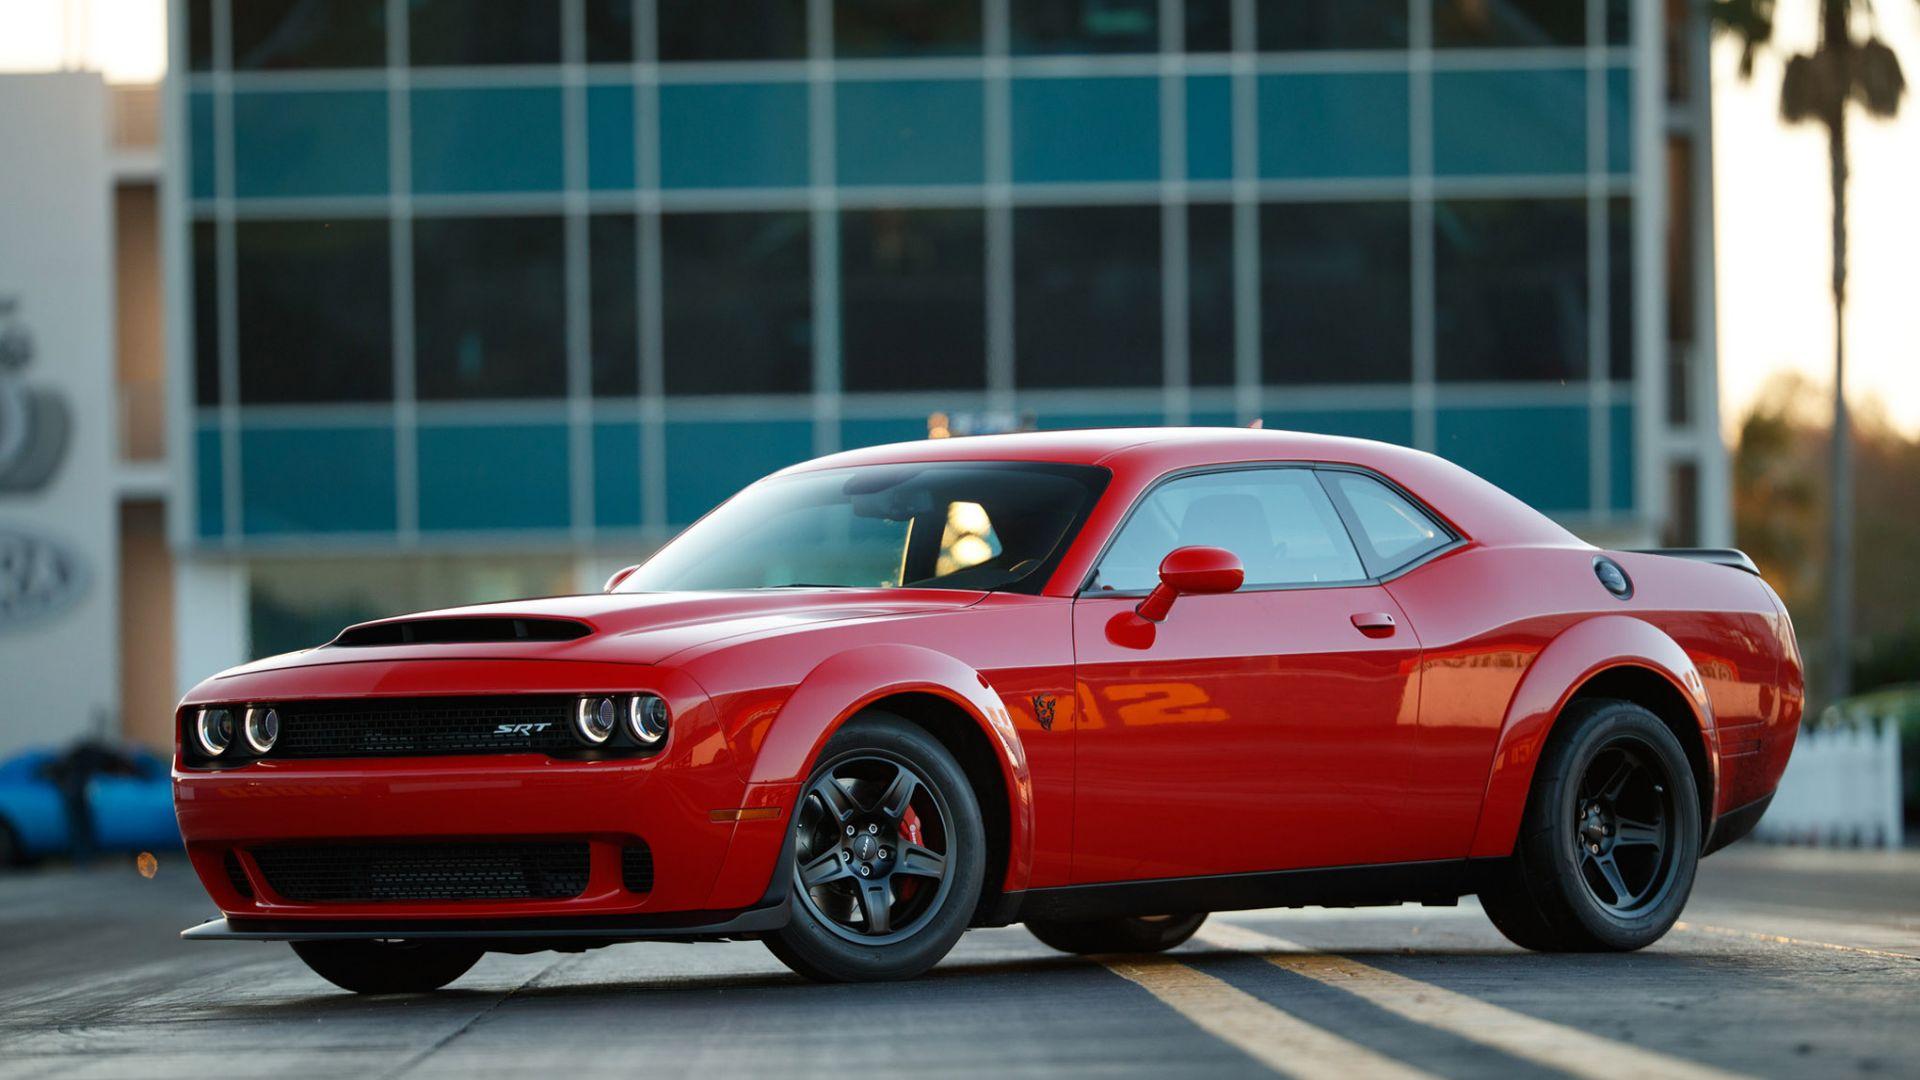 Wallpaper Dodge Challenger SRT Demon, side view, muscle car